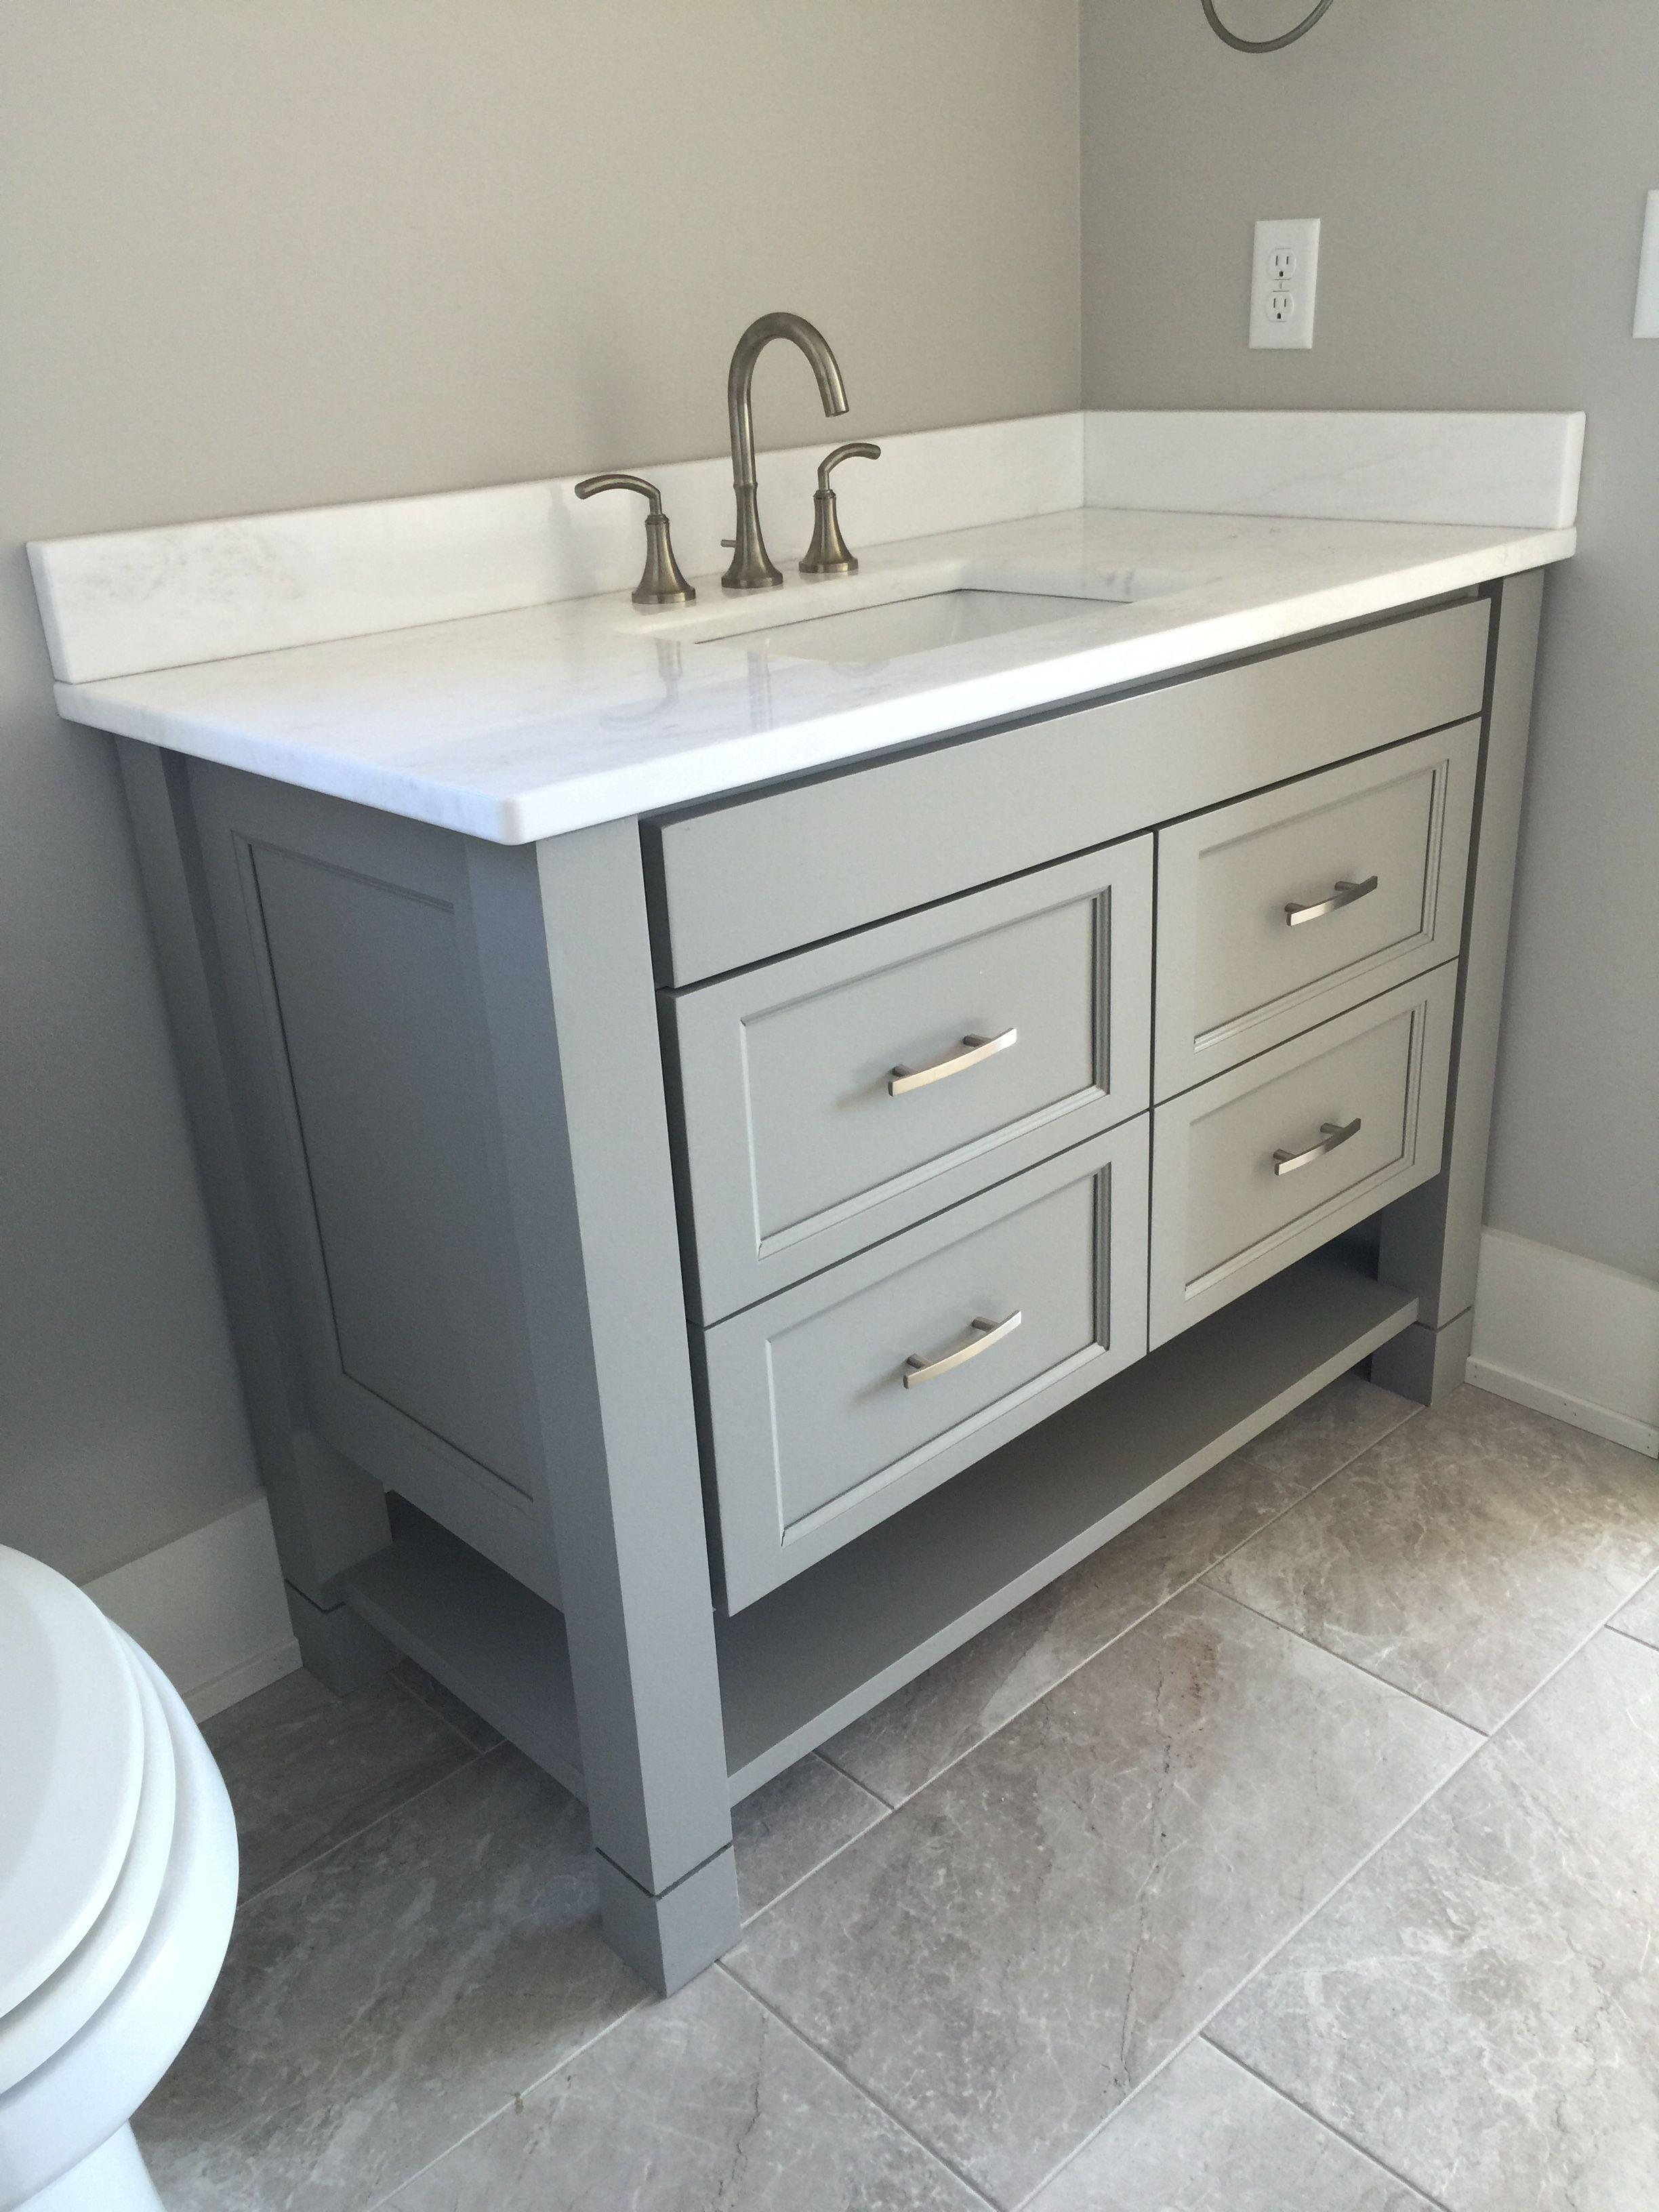 custom bath vanity by stylecraft custom wood products 864 on custom bathroom vanity plans id=64846